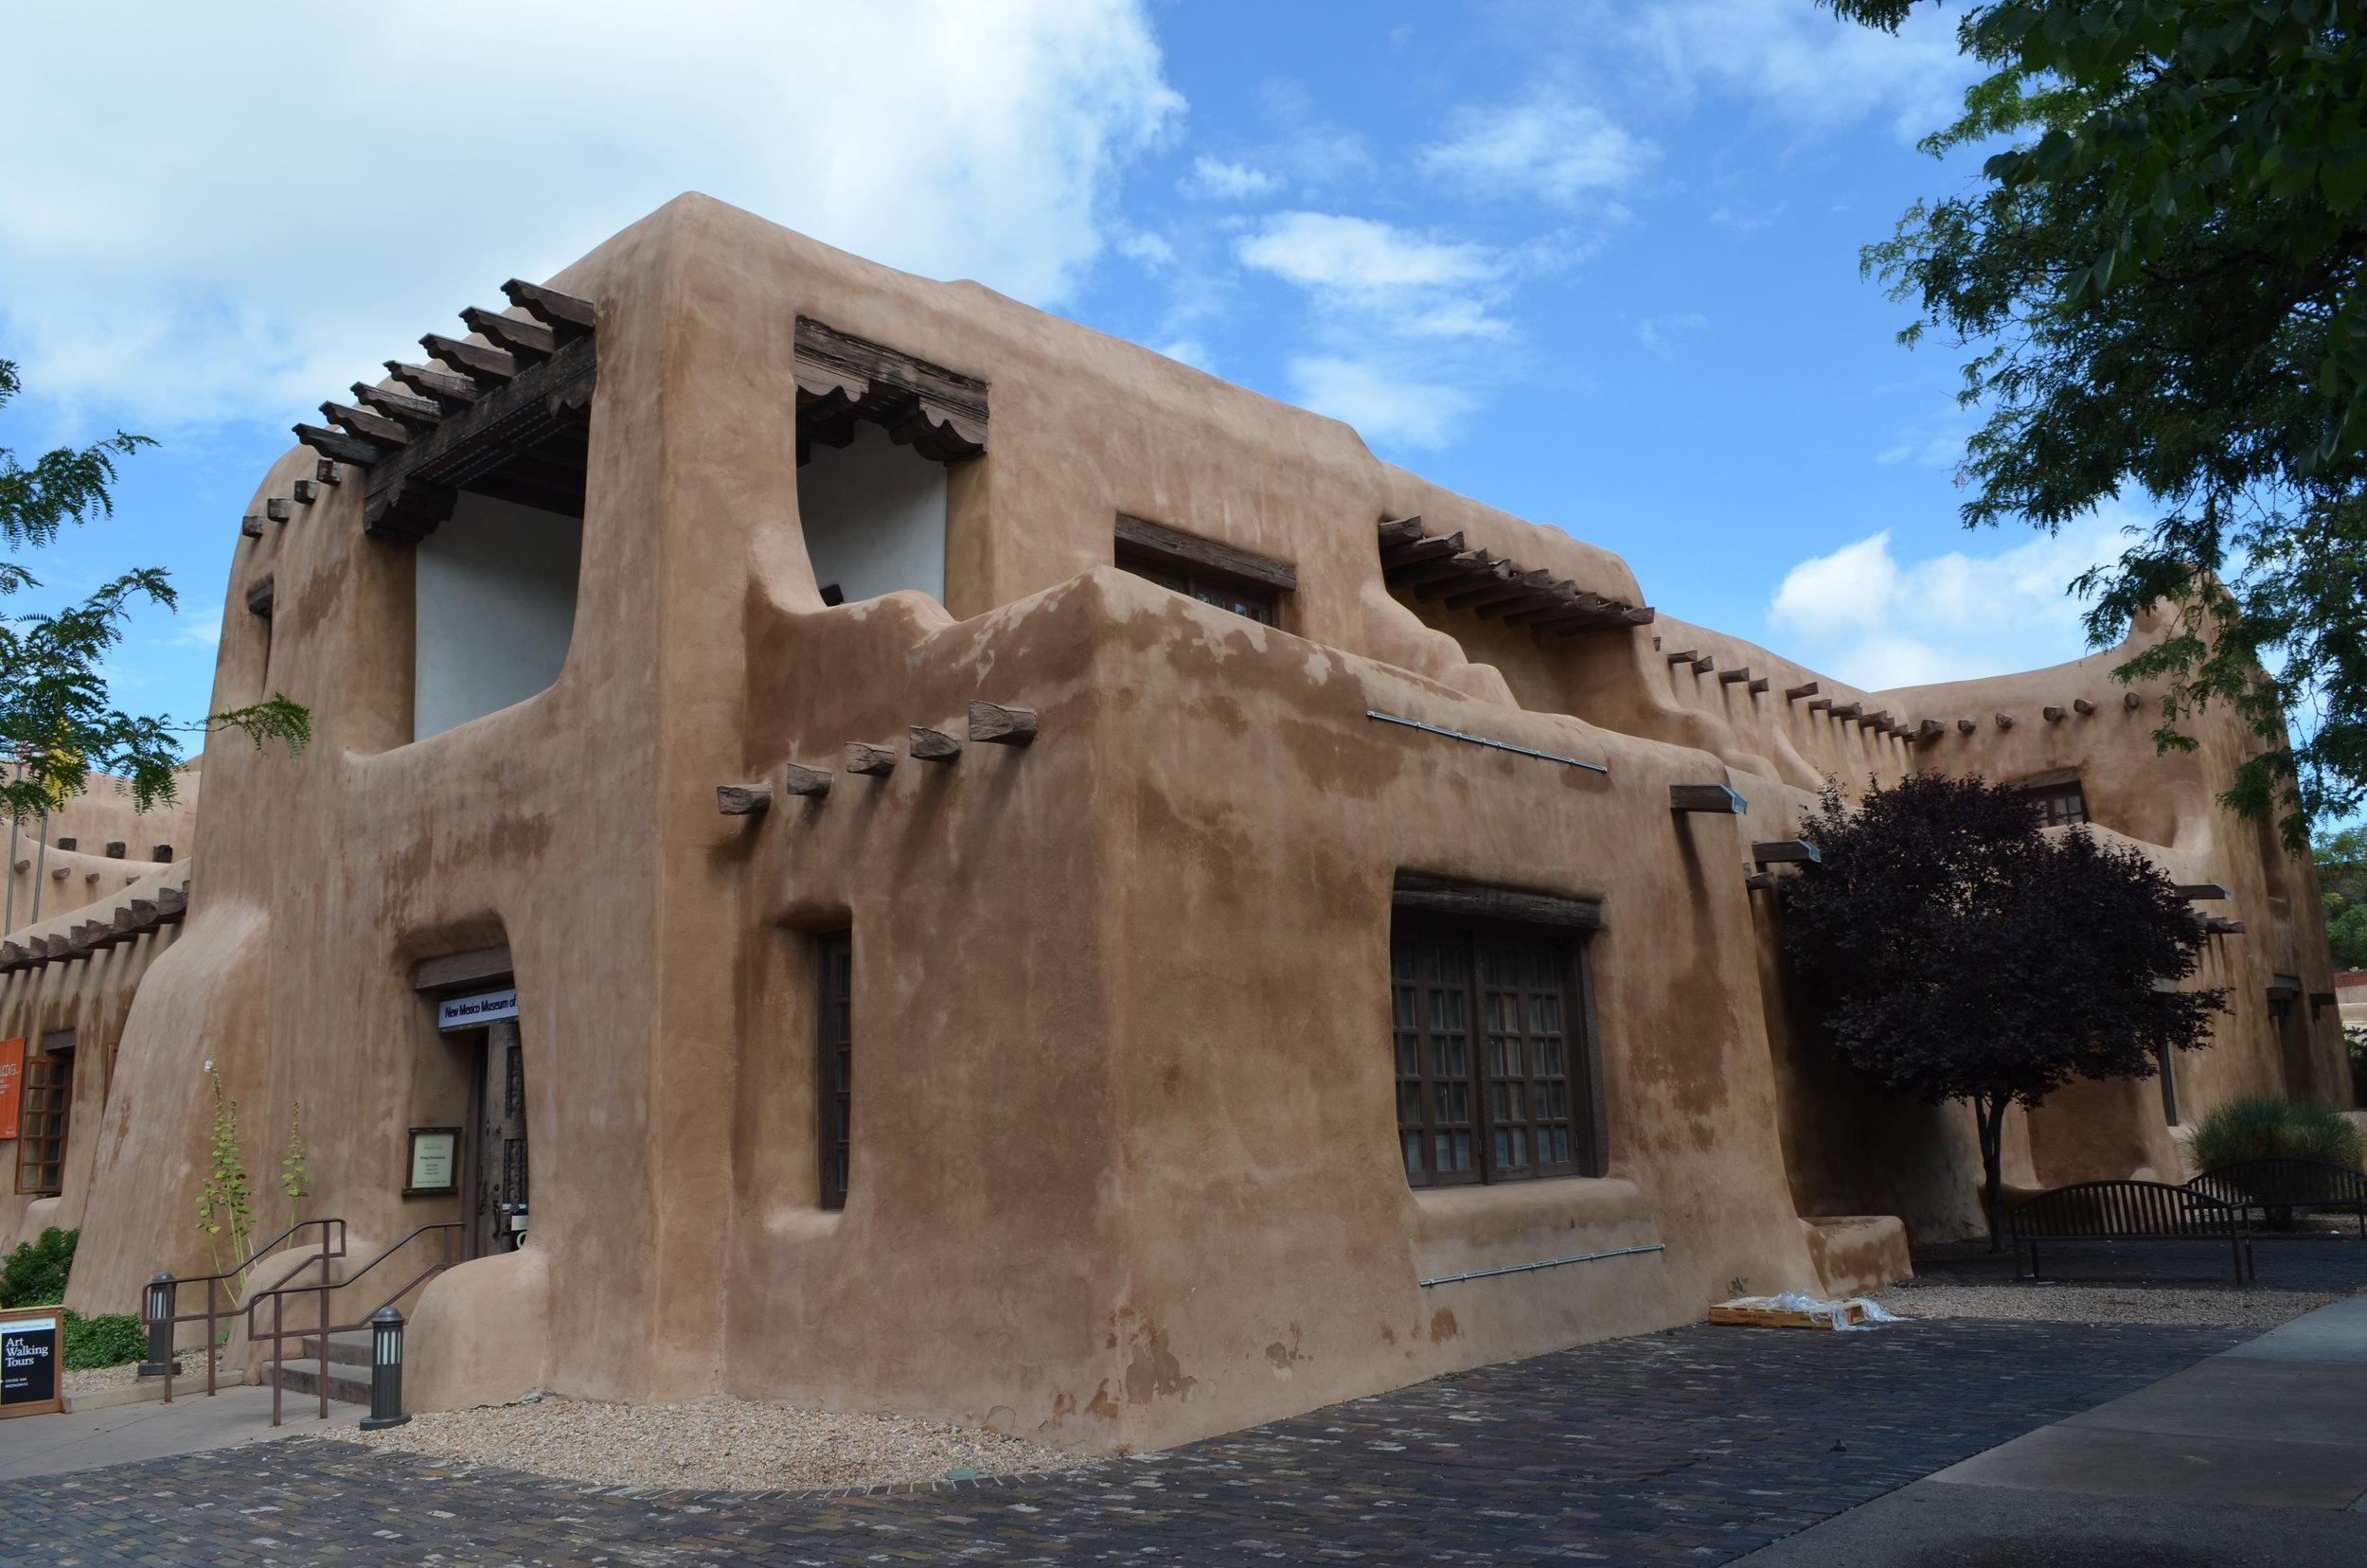 Santa Fe, New Mexico / warporweft.com